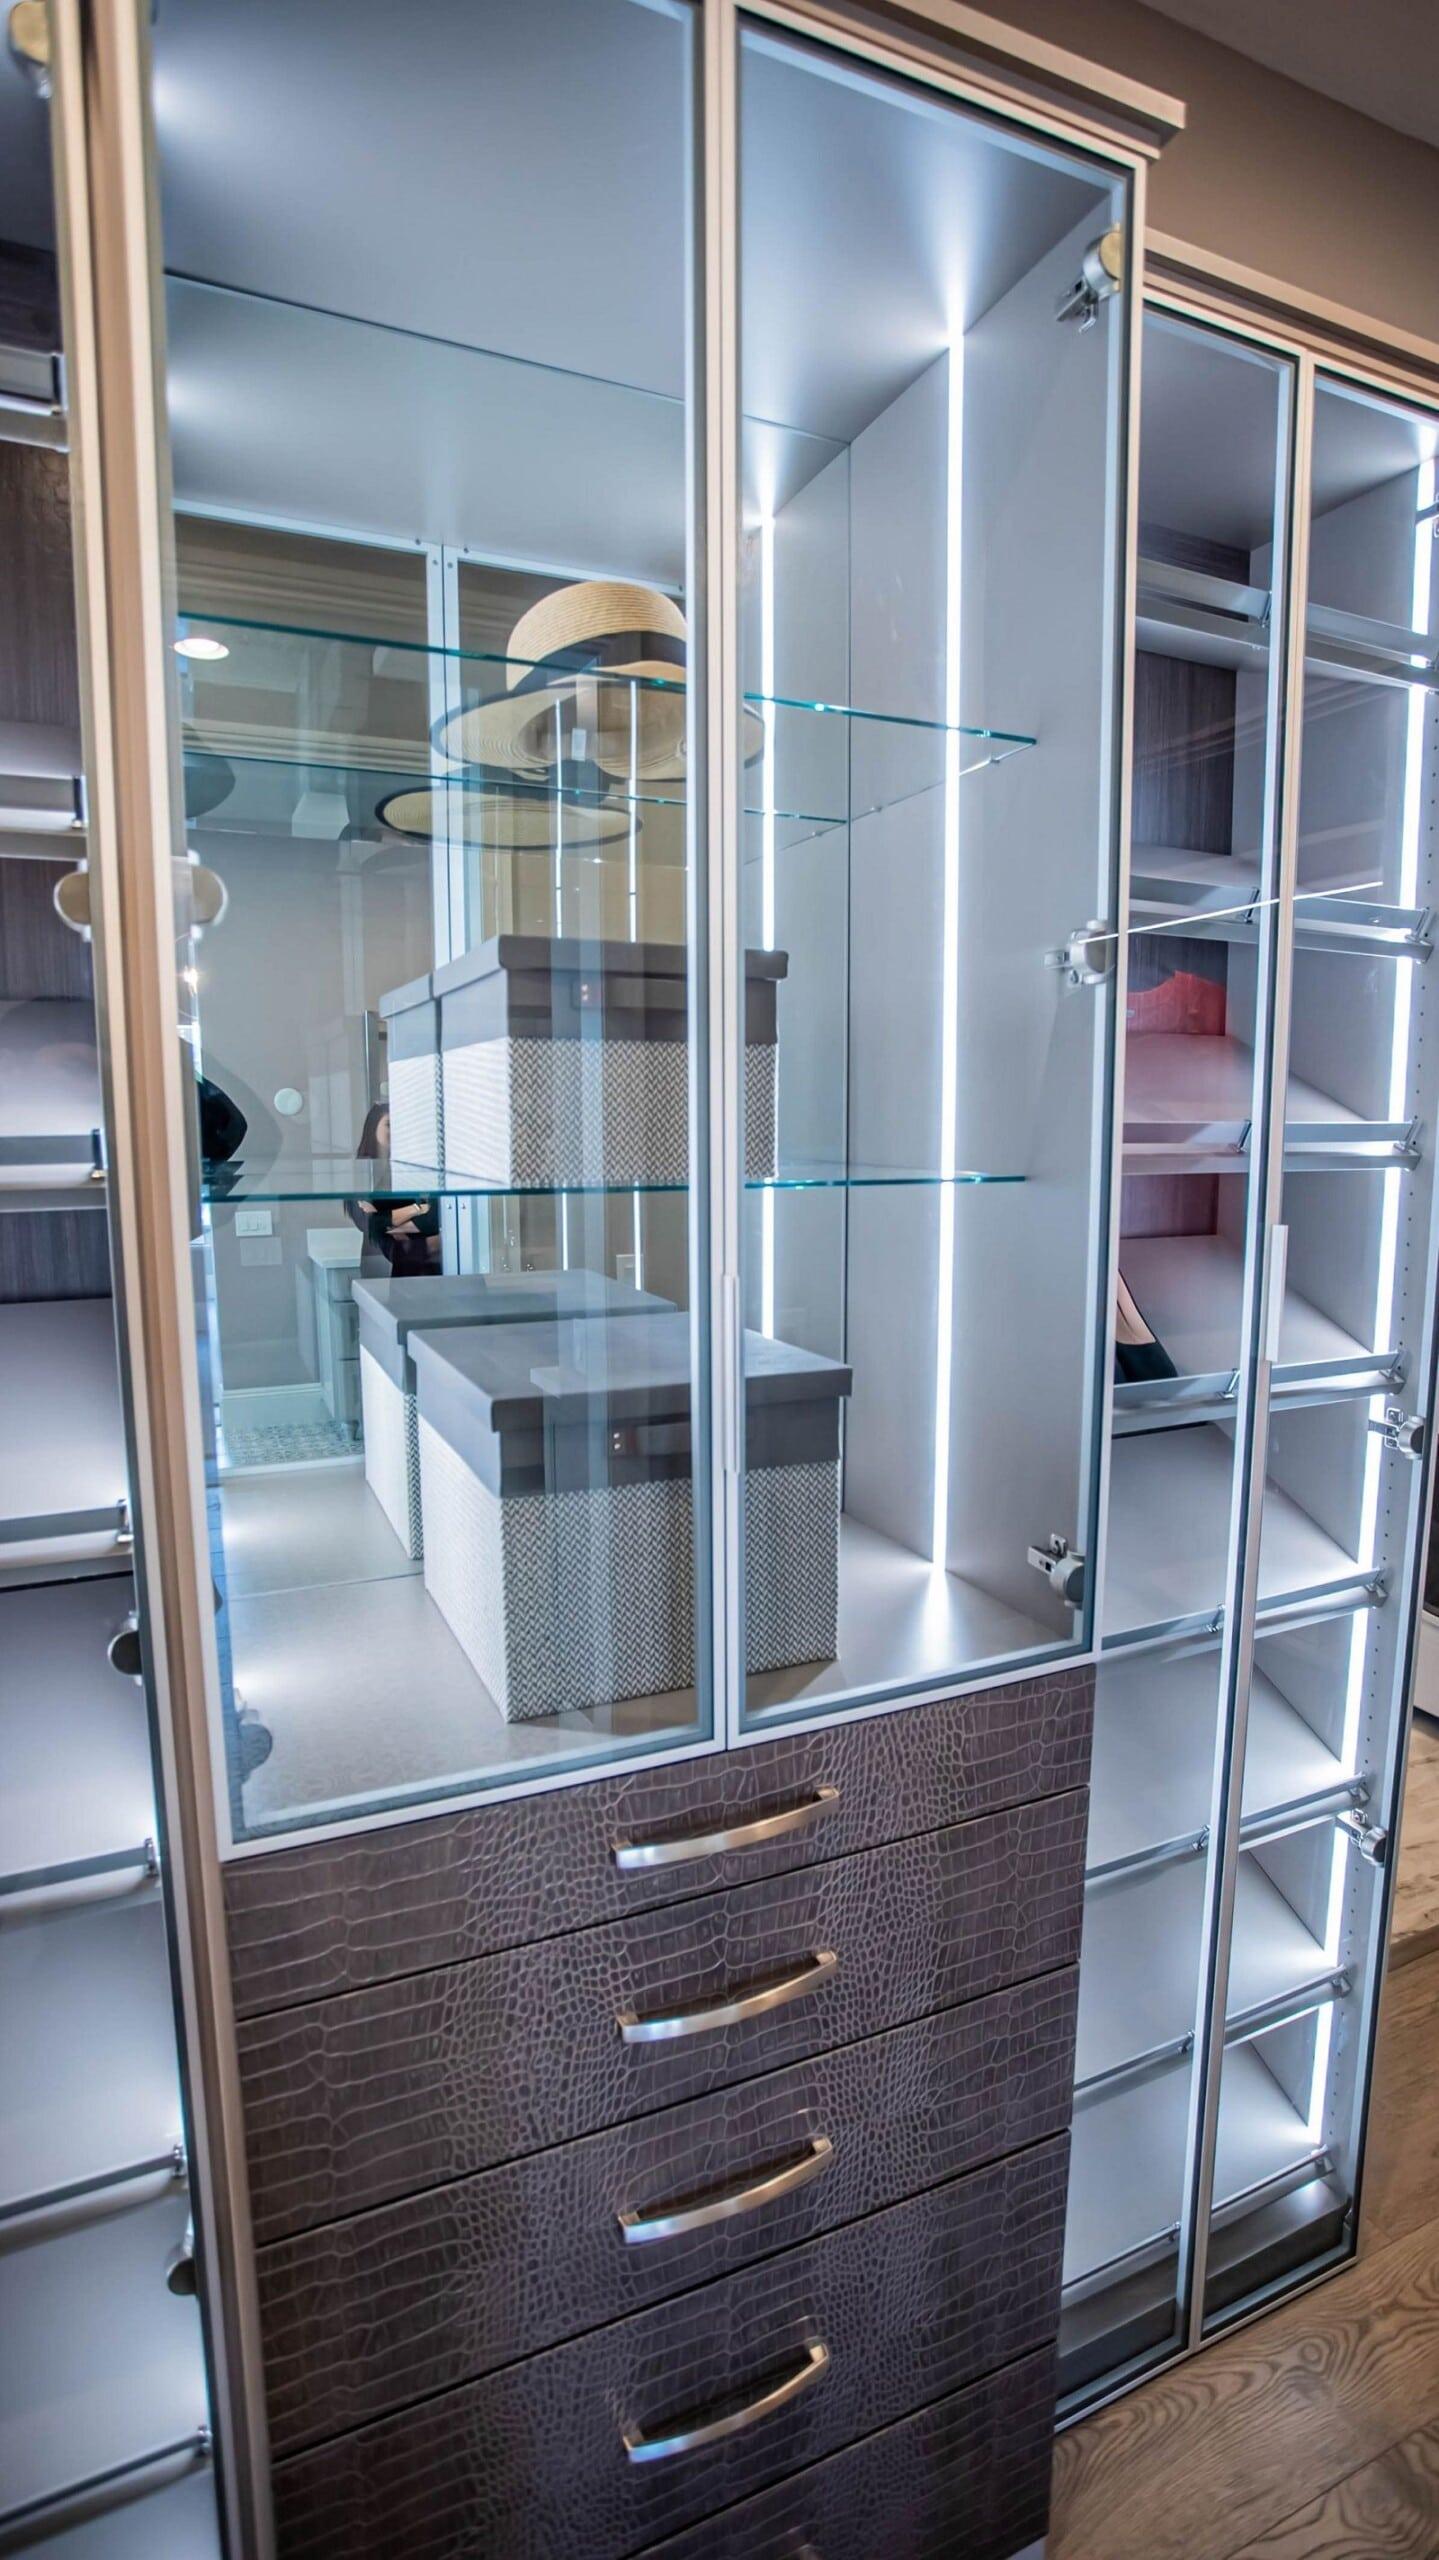 crocodile texture custom drawers and cabinet and shoe rack aluminium framed glass doors